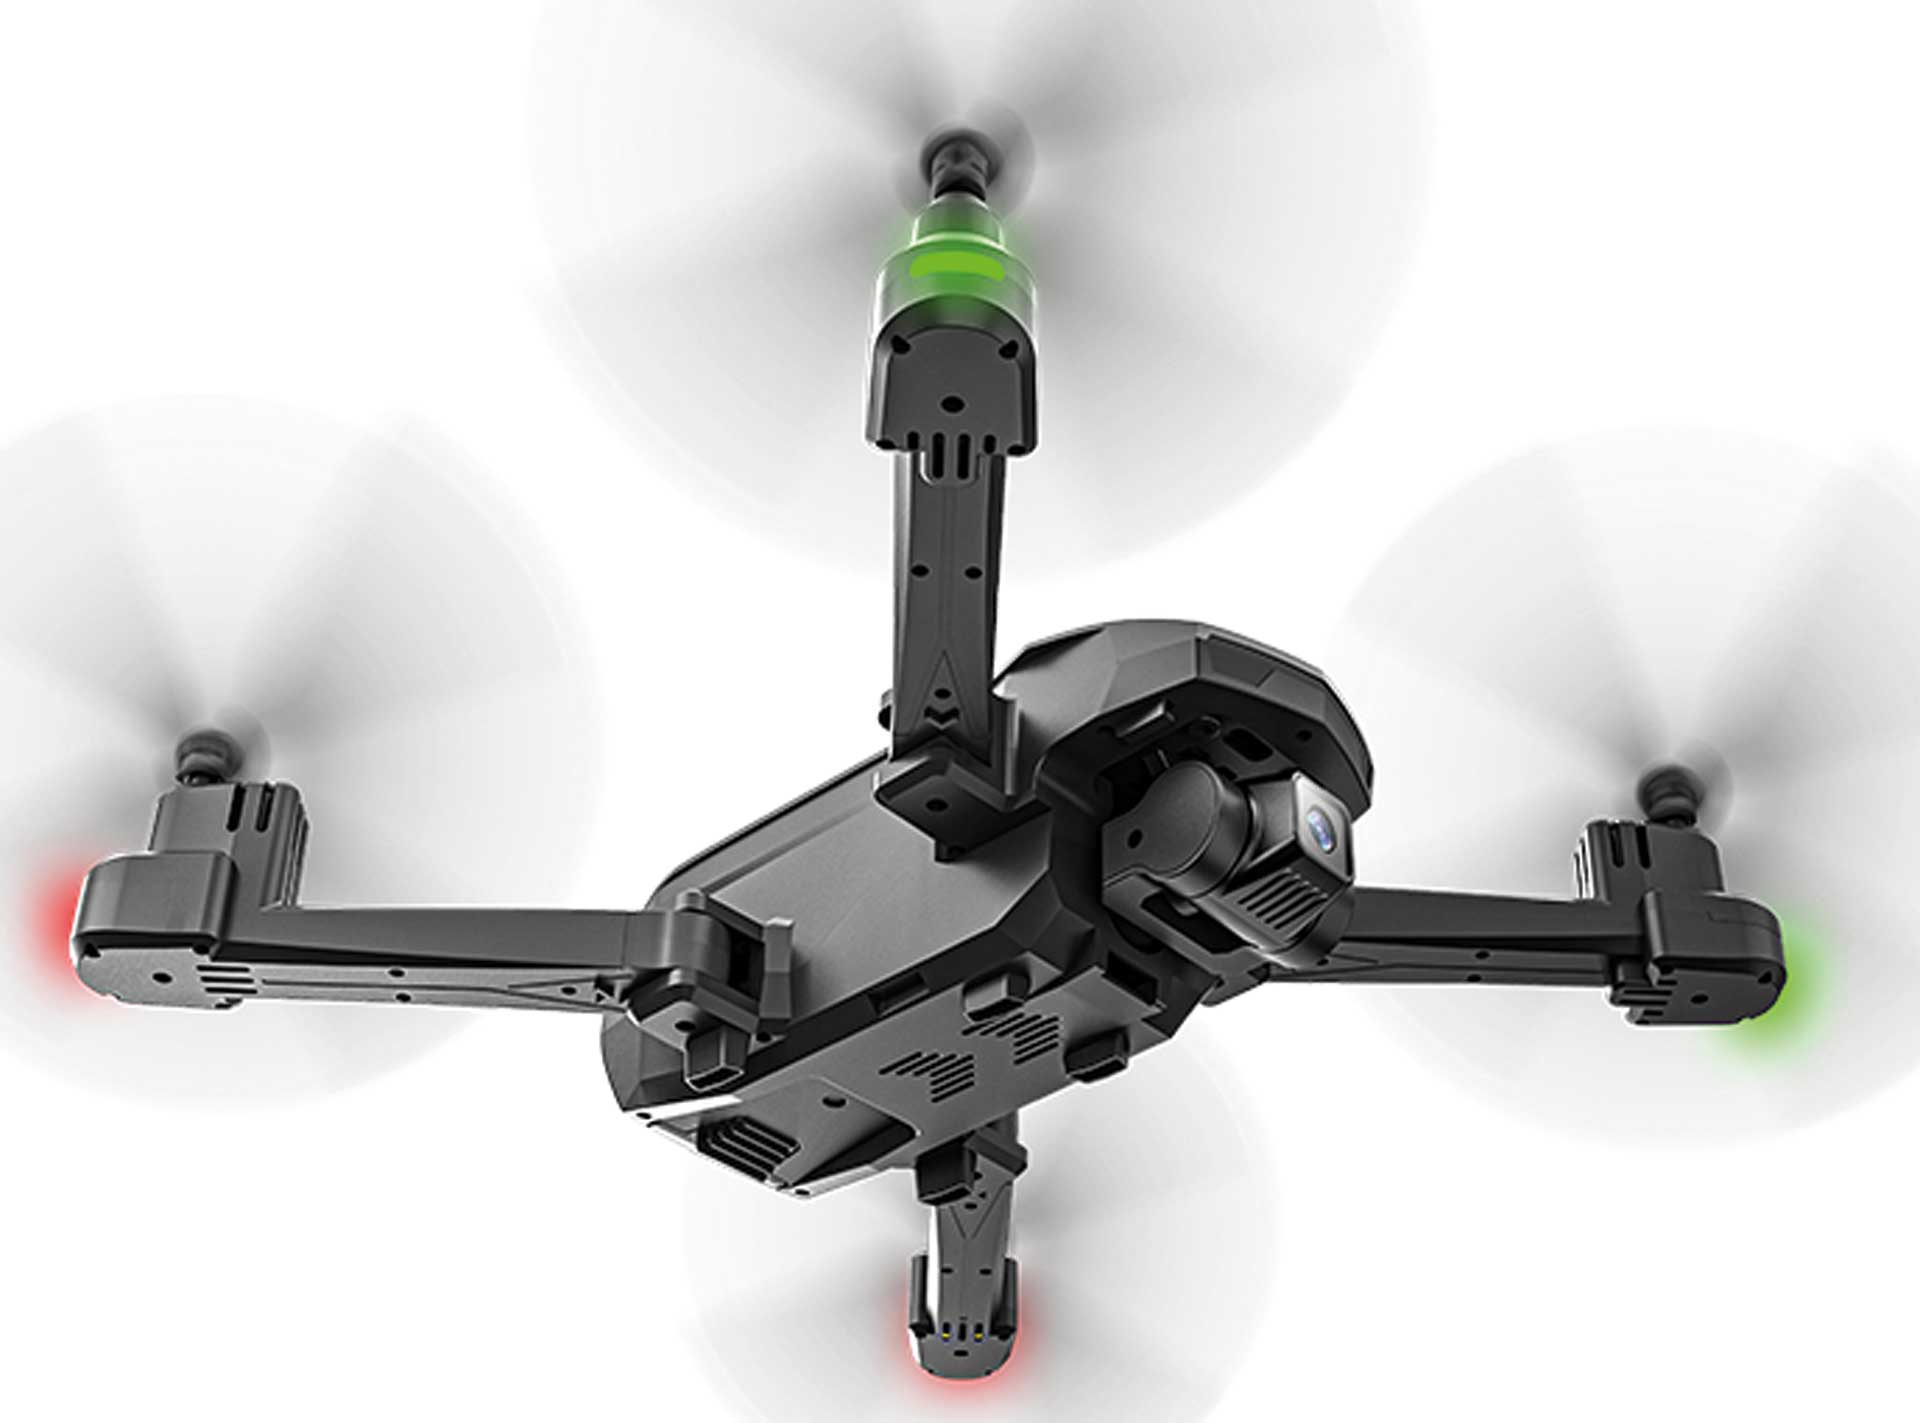 DRIVE & FLY MODELS SkyWatcher Lark V3 2.7K Gimbal - GPS